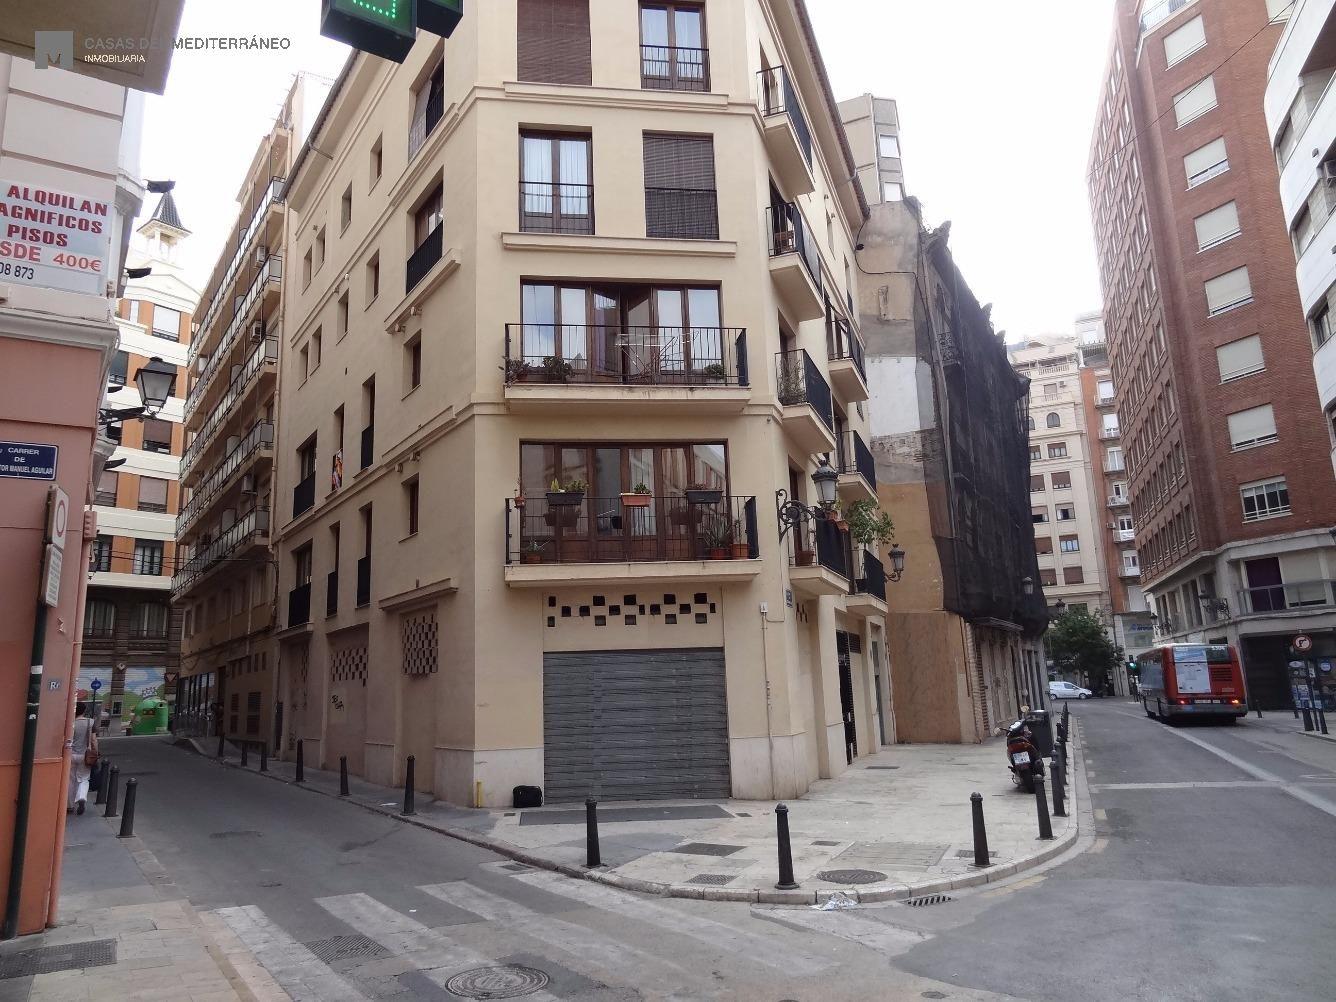 local-comercial en valencia · el-mercat 210000€